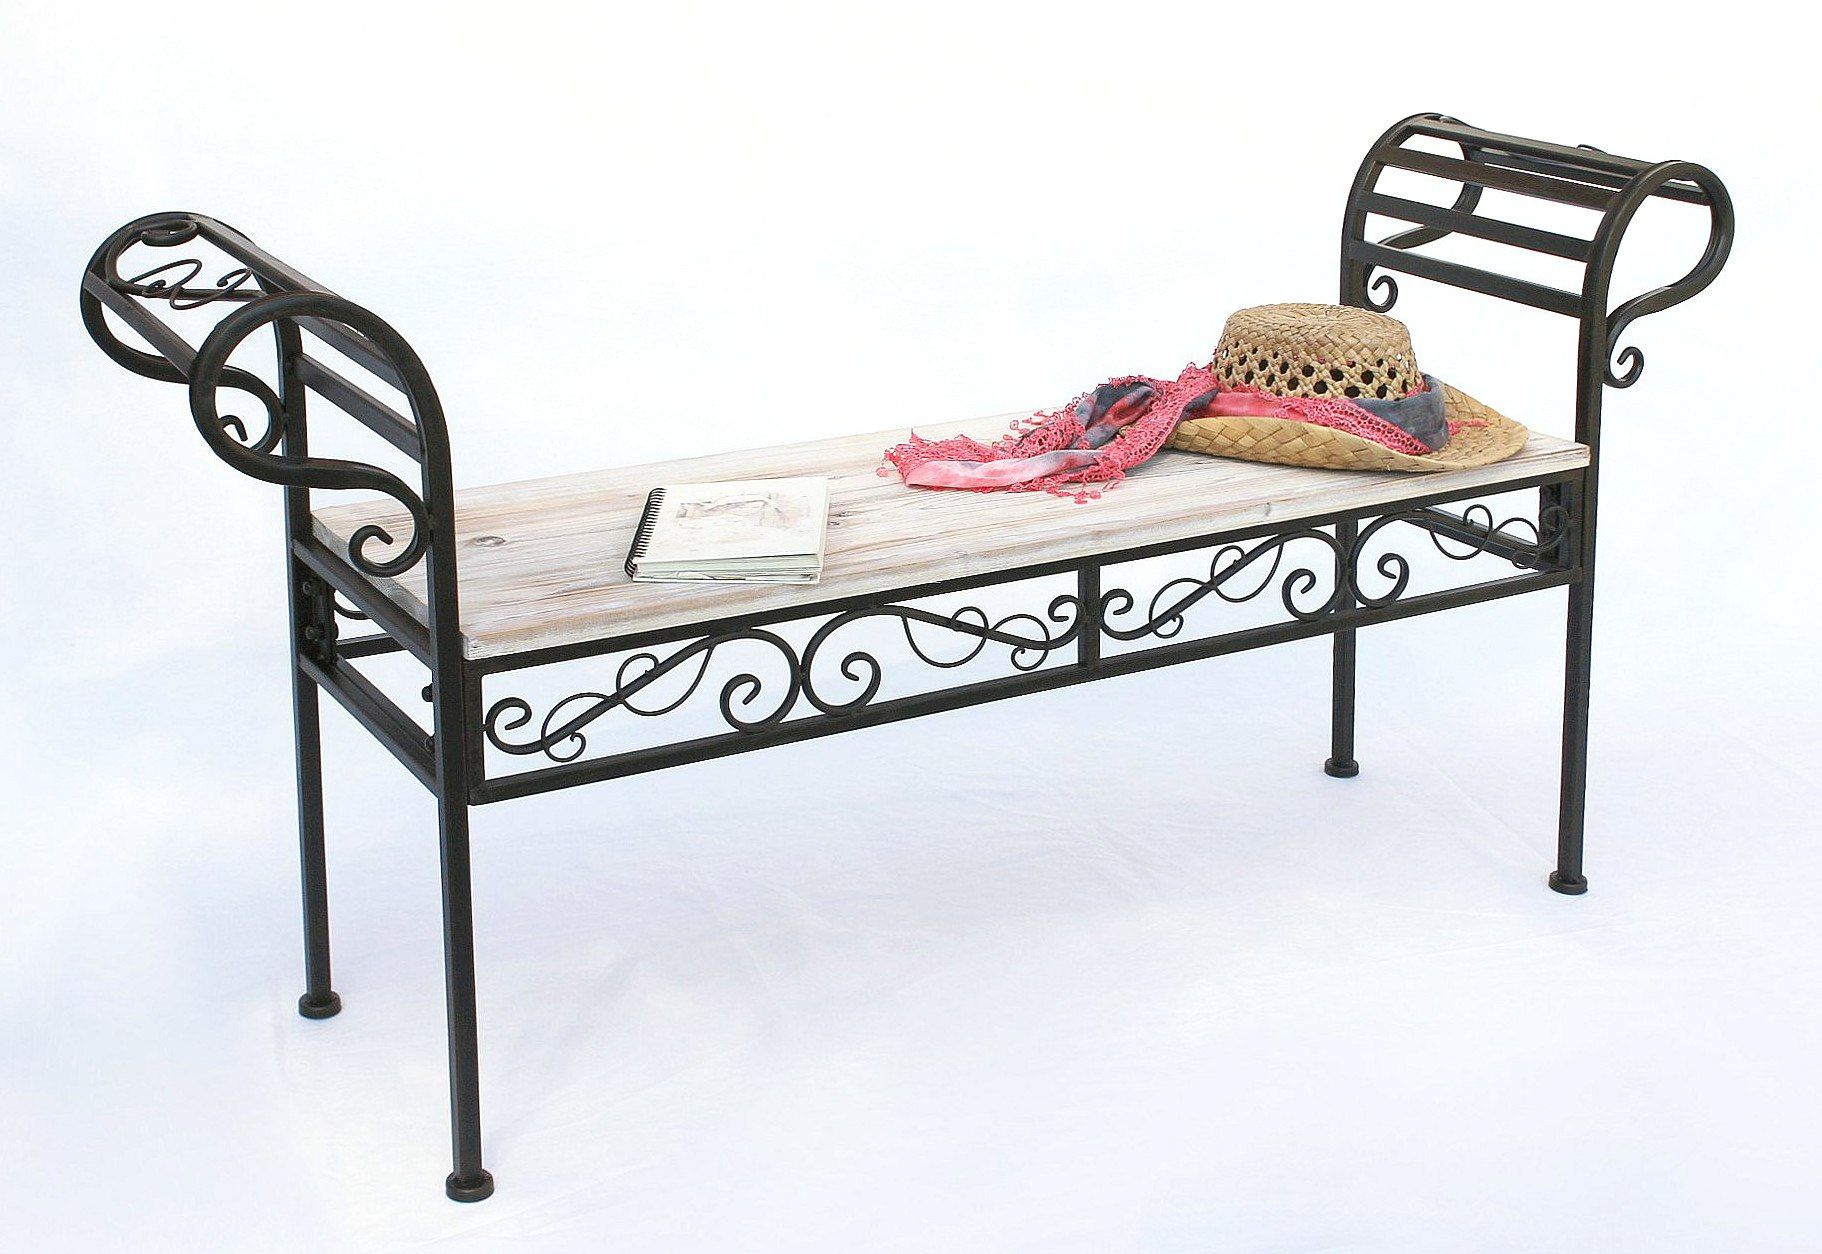 gartenbank 19279 bank 133cm aus metall und holz sitzbank parkbank schmiedeeisen dandibo. Black Bedroom Furniture Sets. Home Design Ideas